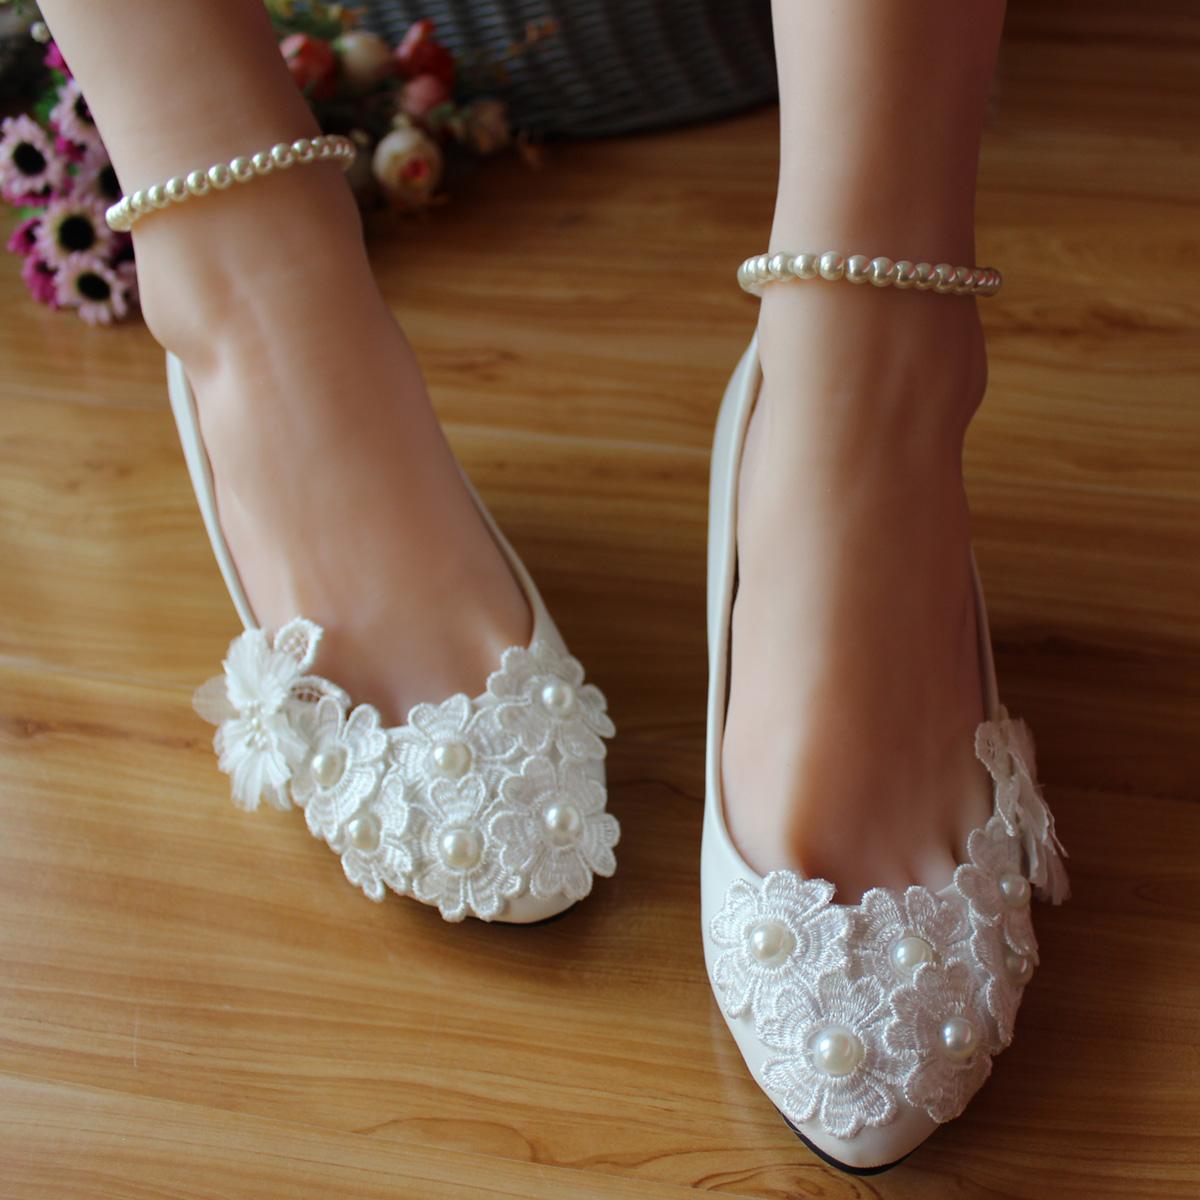 Zapatos De Dqxxgyzw Zapatos Novia De Eventi zVjqSUGMpL